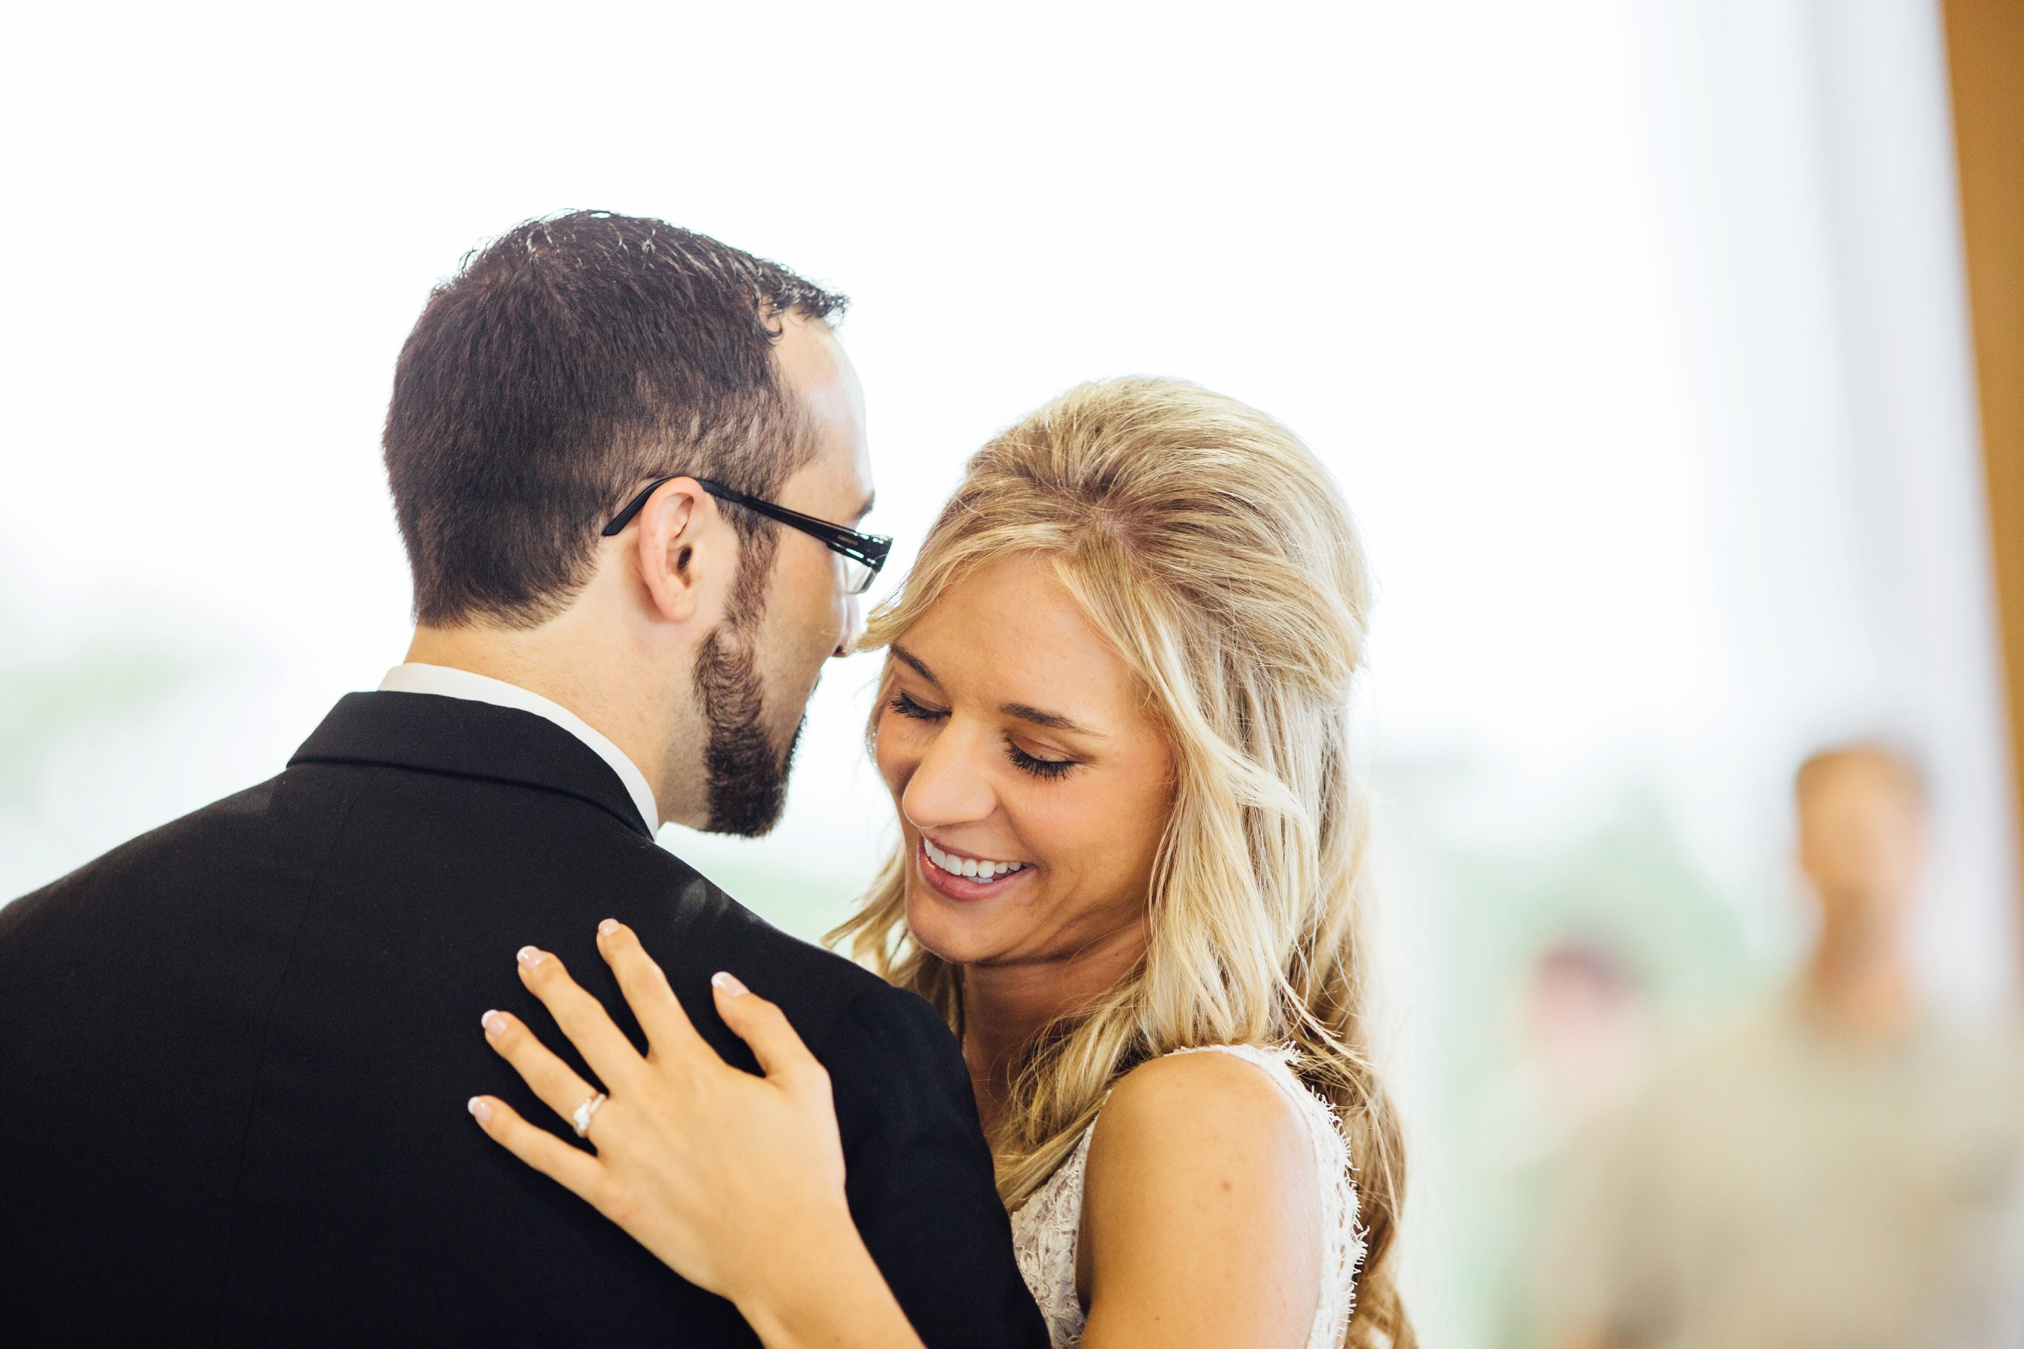 schmid_wedding-766.jpg